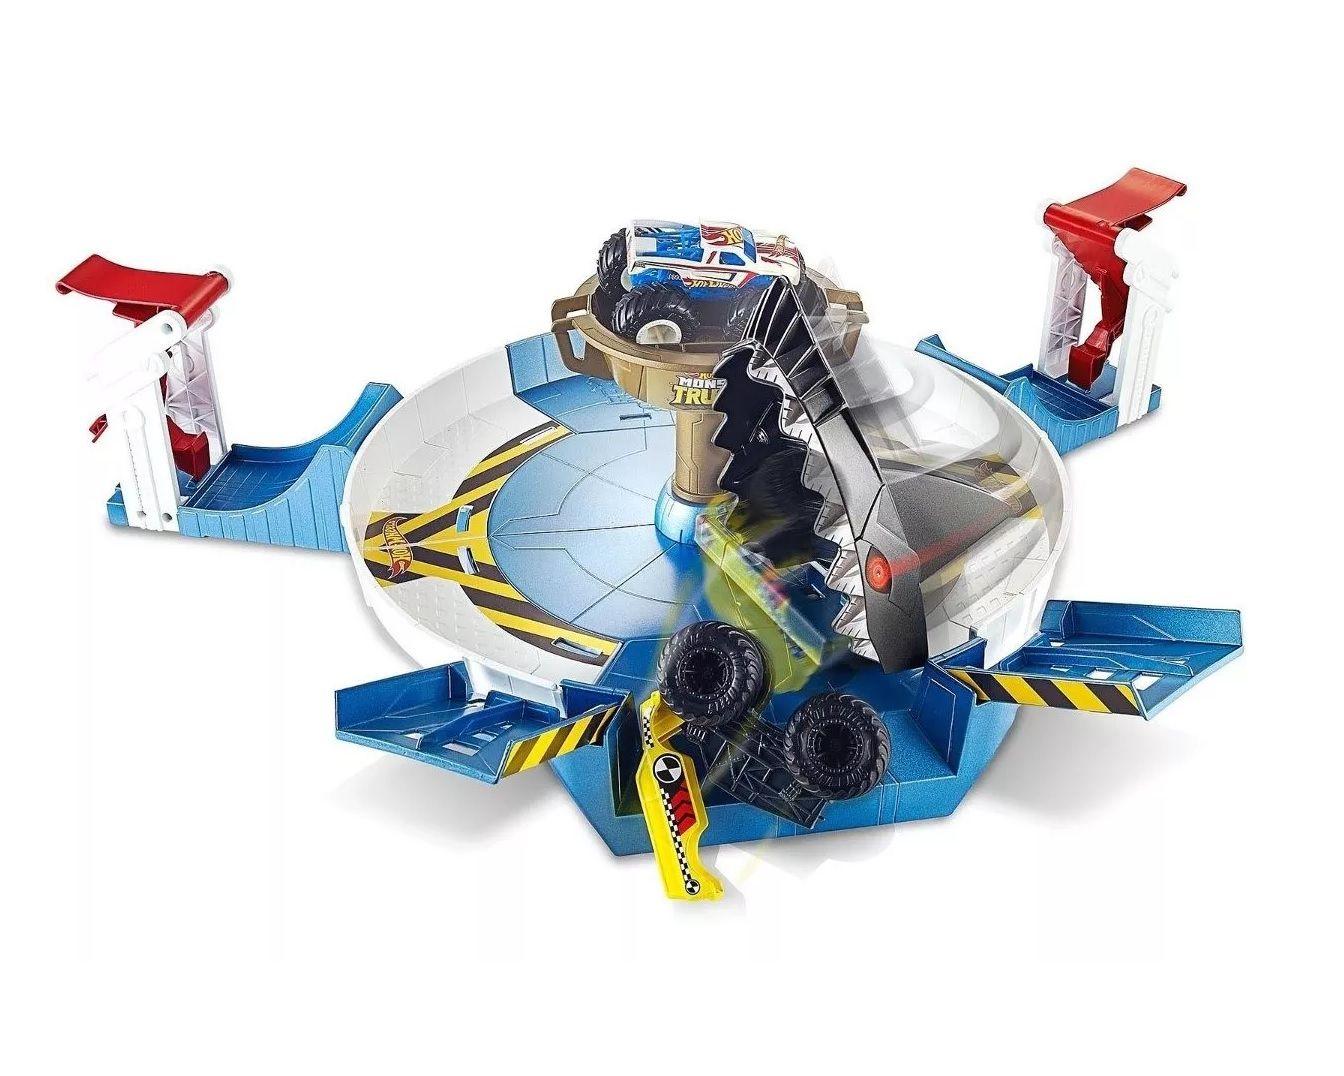 Pista Hot Wheels Monster Trucks Batalha do Tubarão Mecha - Mattel